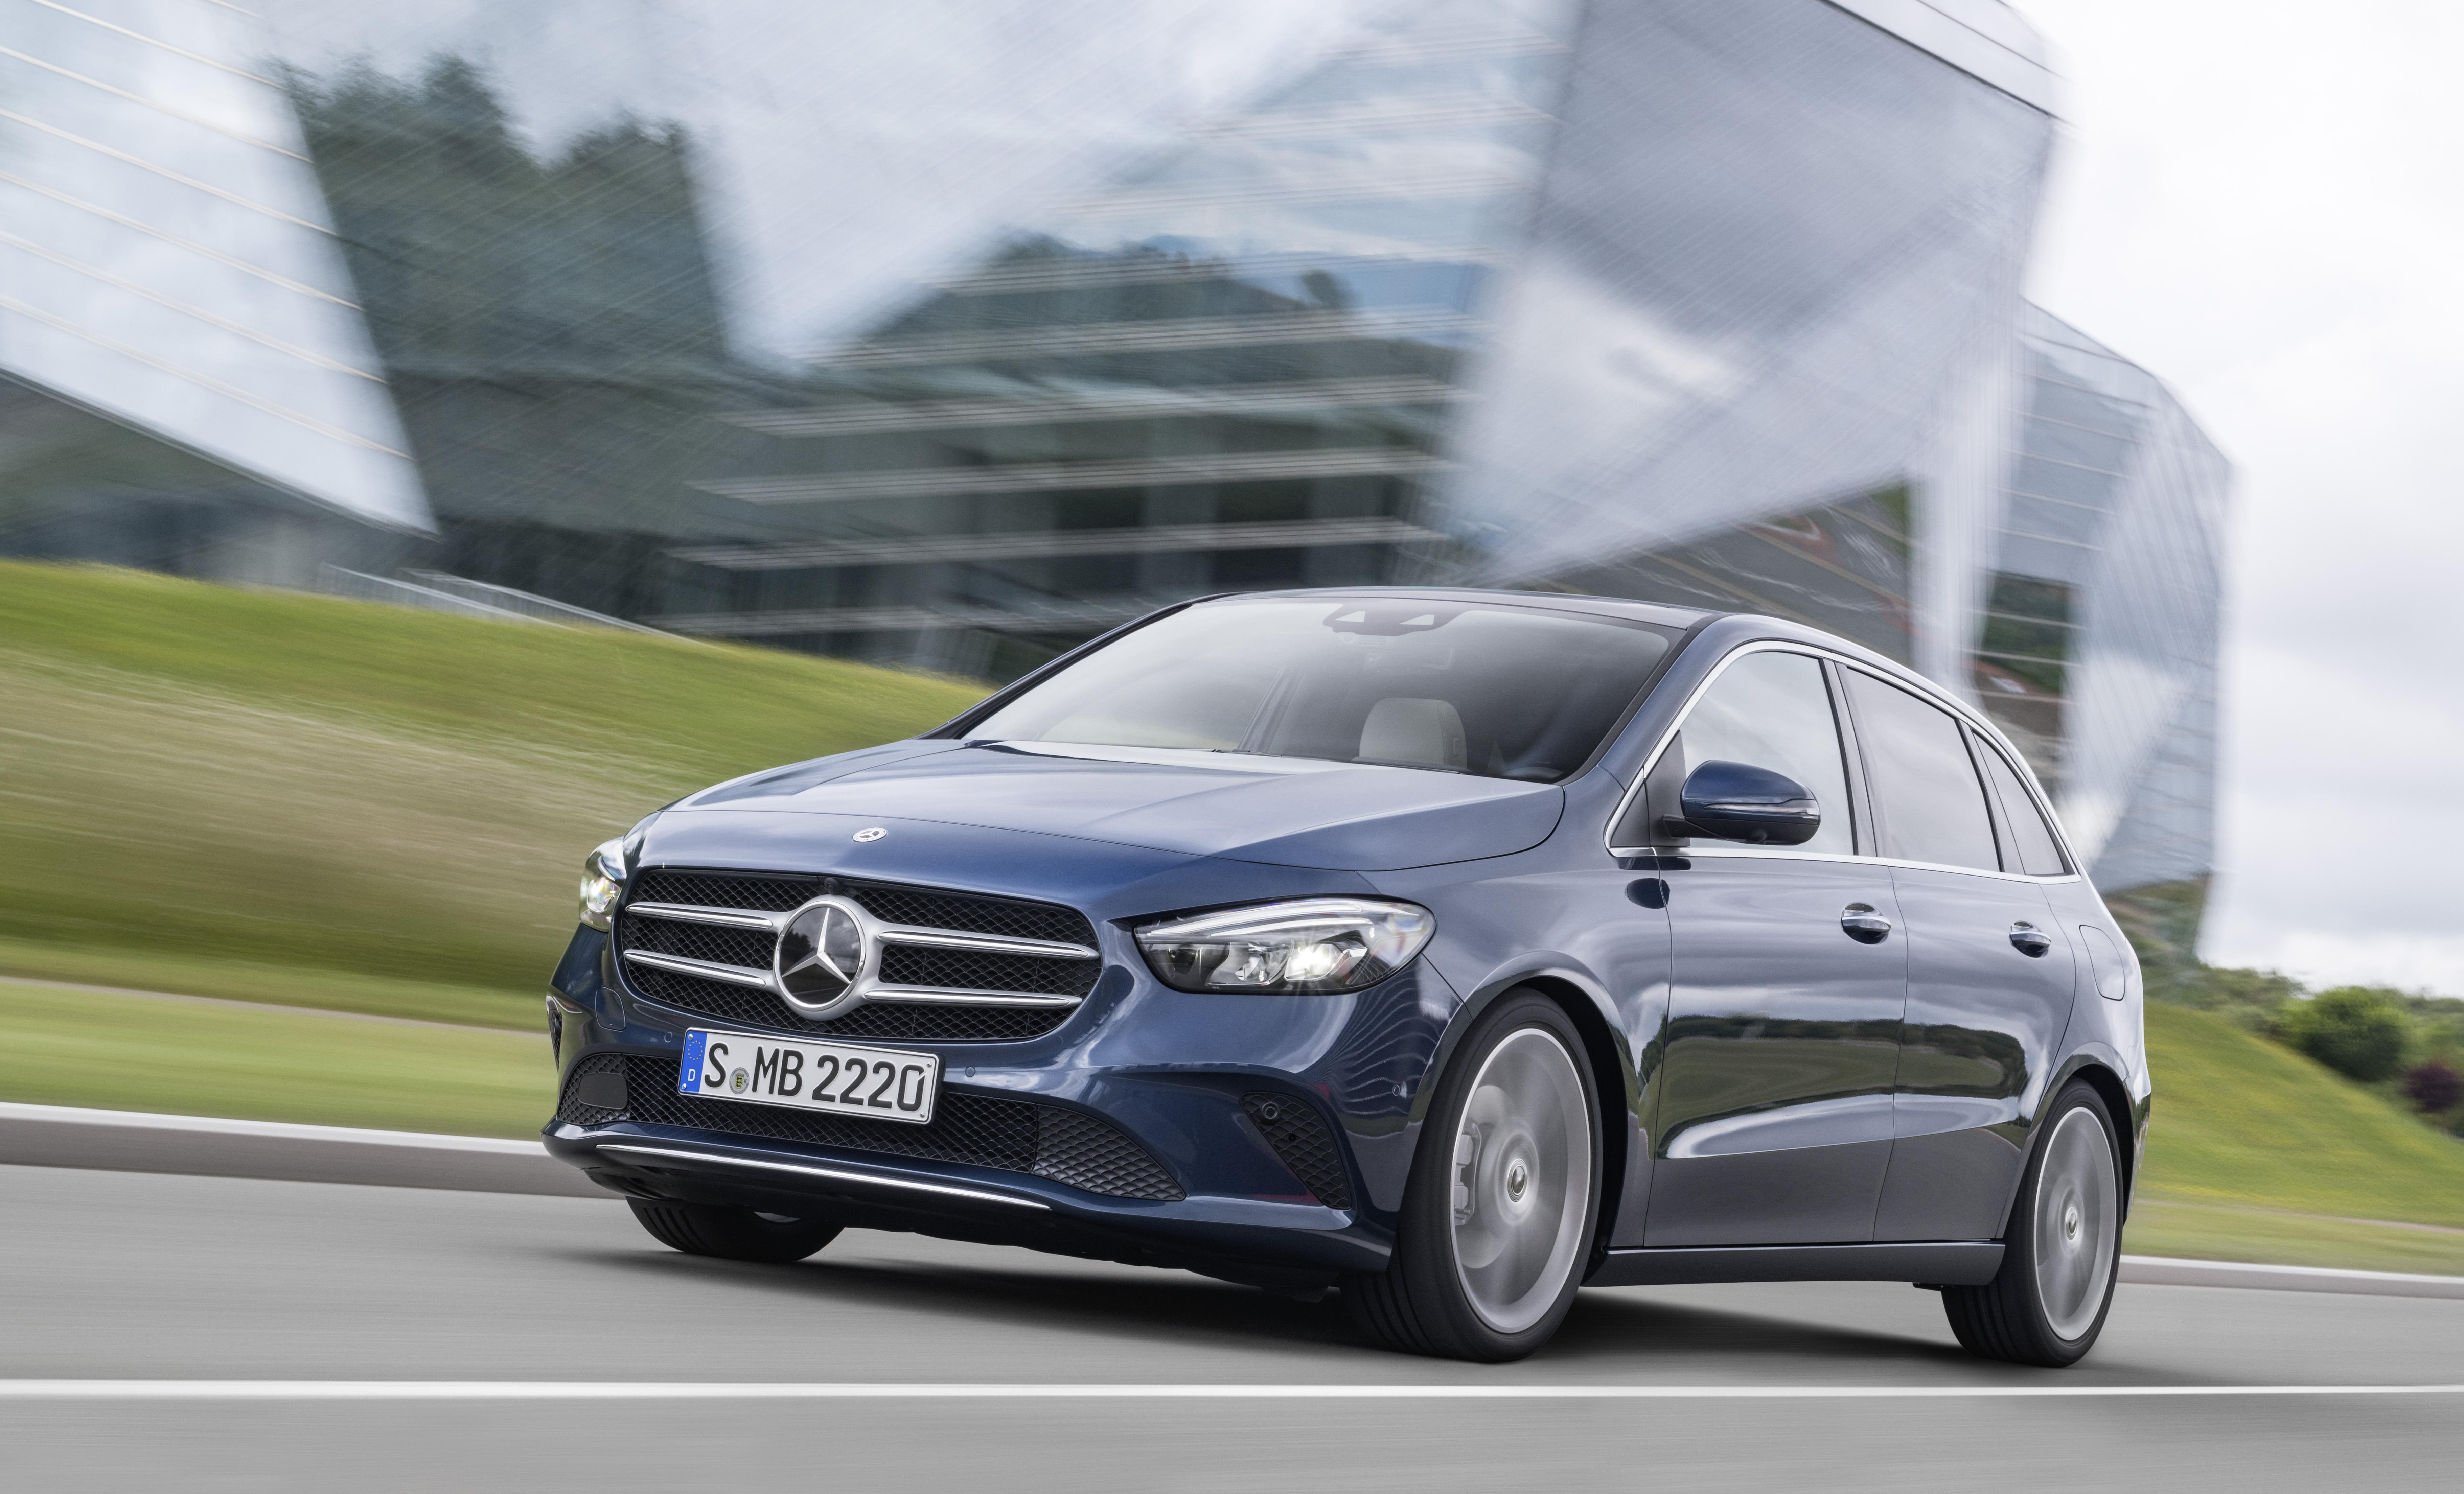 Nova Mercedes-Benz B-Klasa predstavljena u Parizu